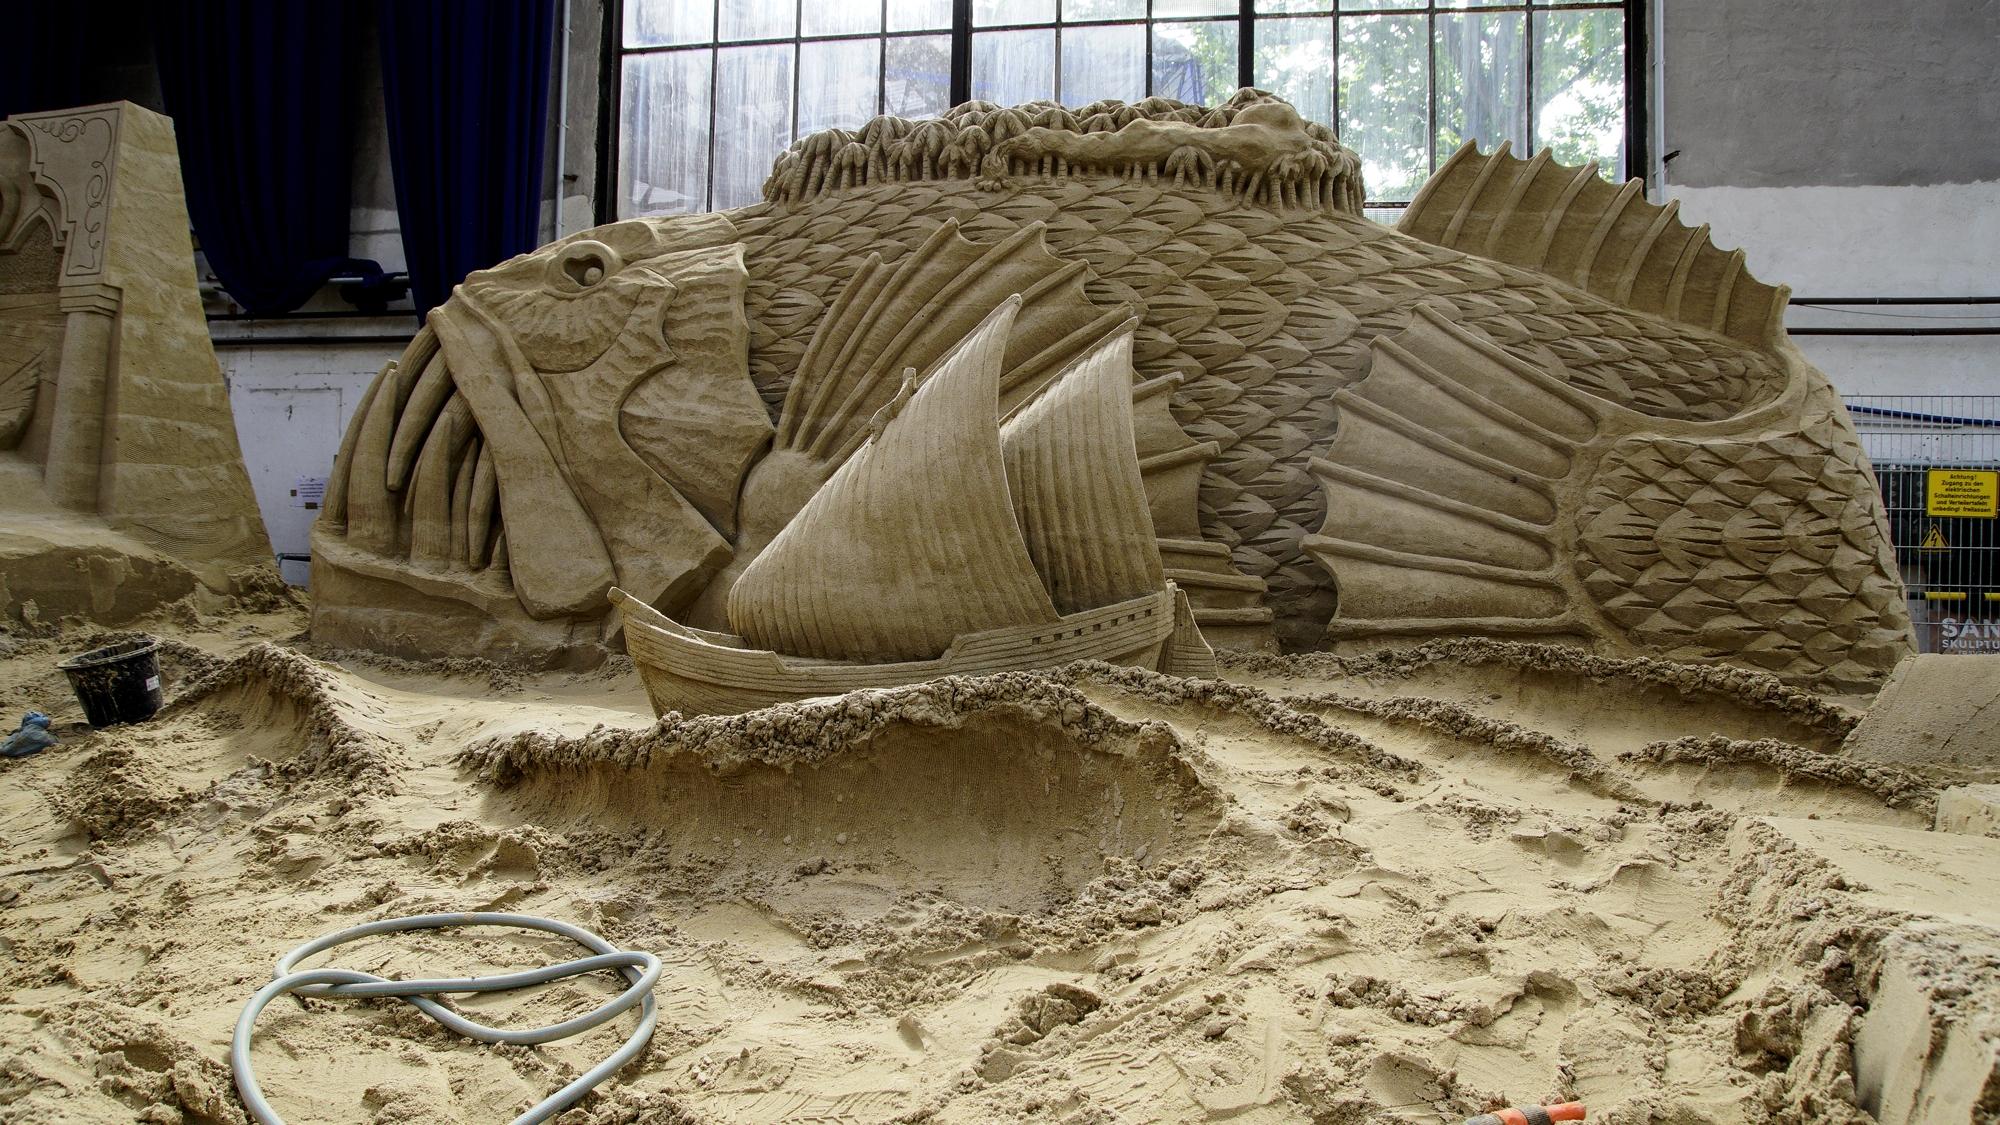 Sandskulturen-Travemünde-2020-©-TraveMedia